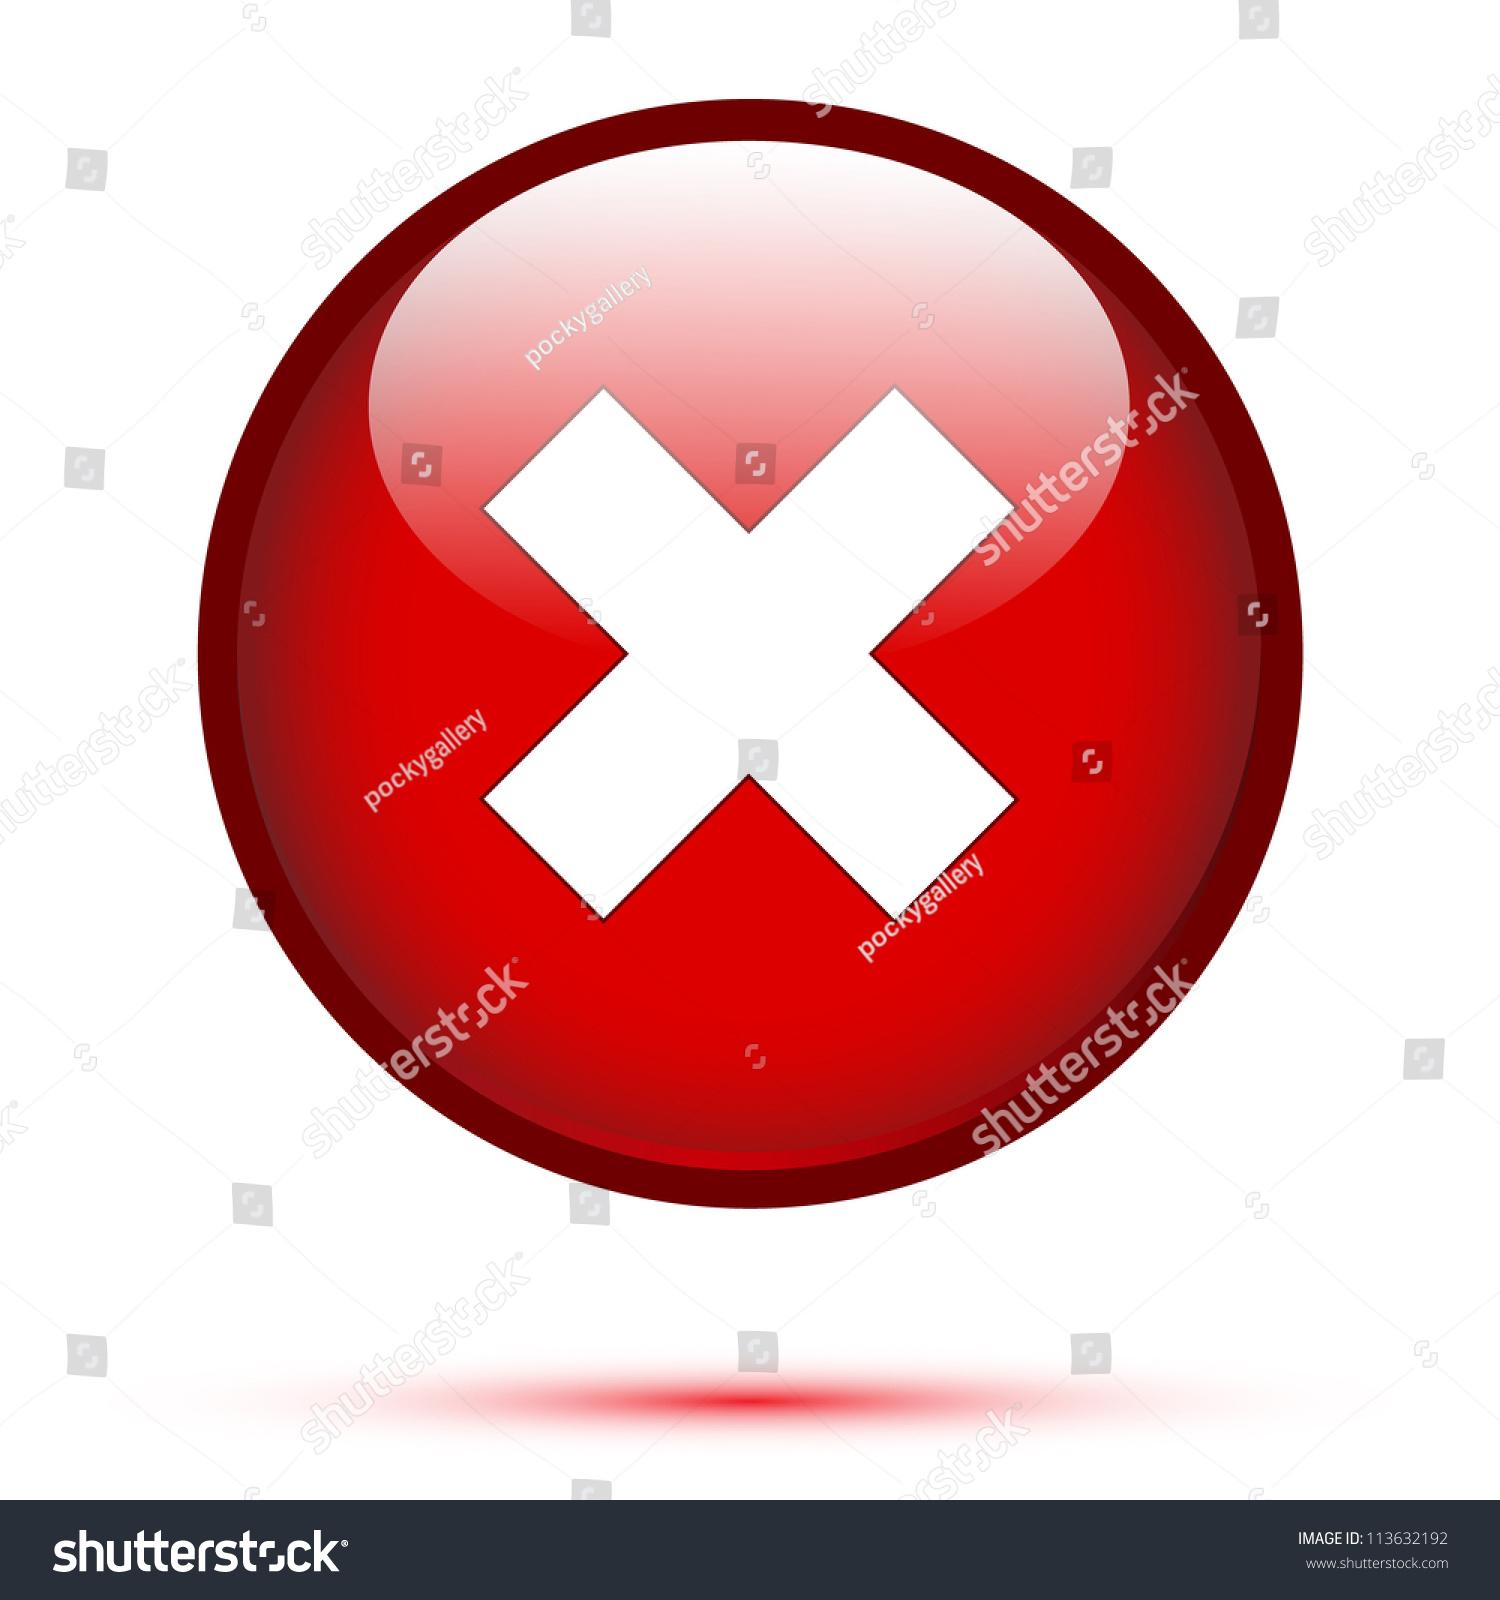 Delete Icon On White Background Stock Vector 113632192 - Shutterstock